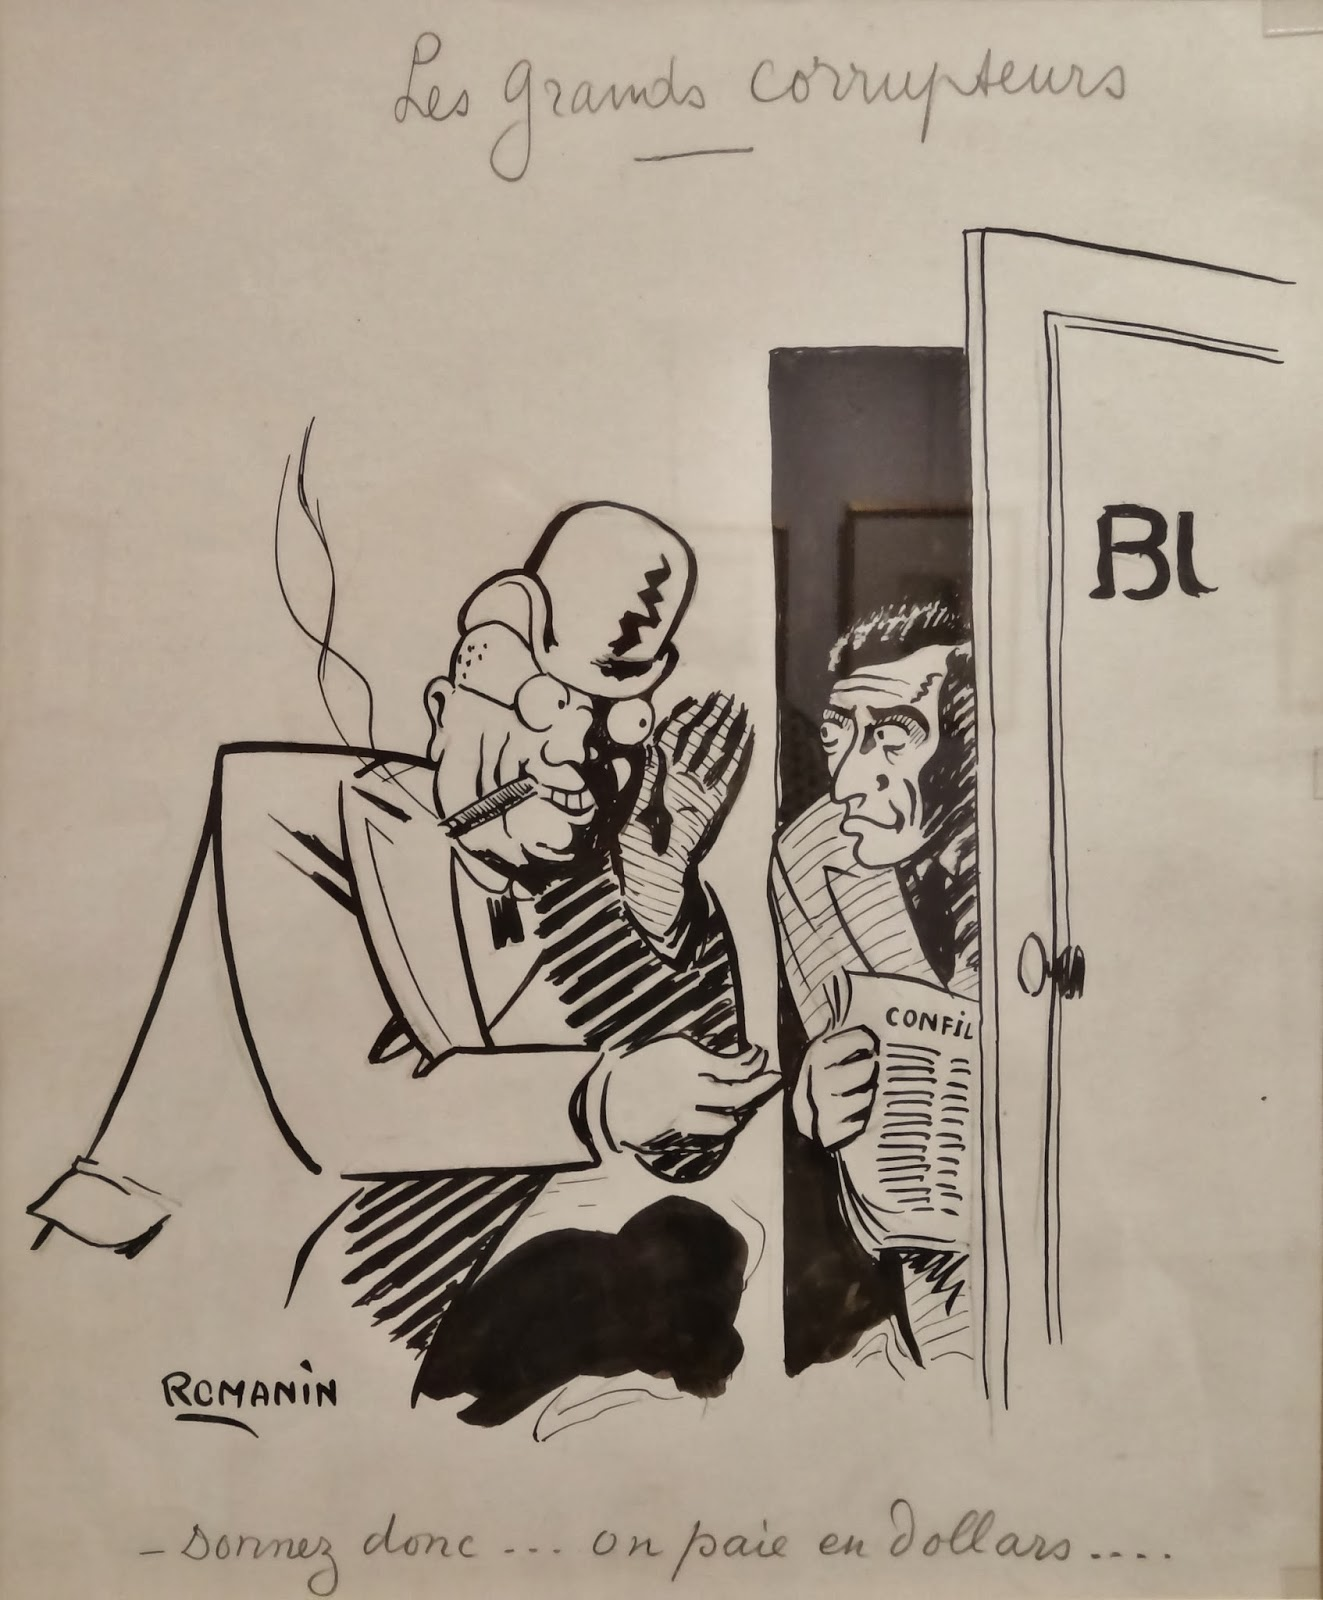 Jean+Moulin+-+les+grands+corrupteurs.JPG